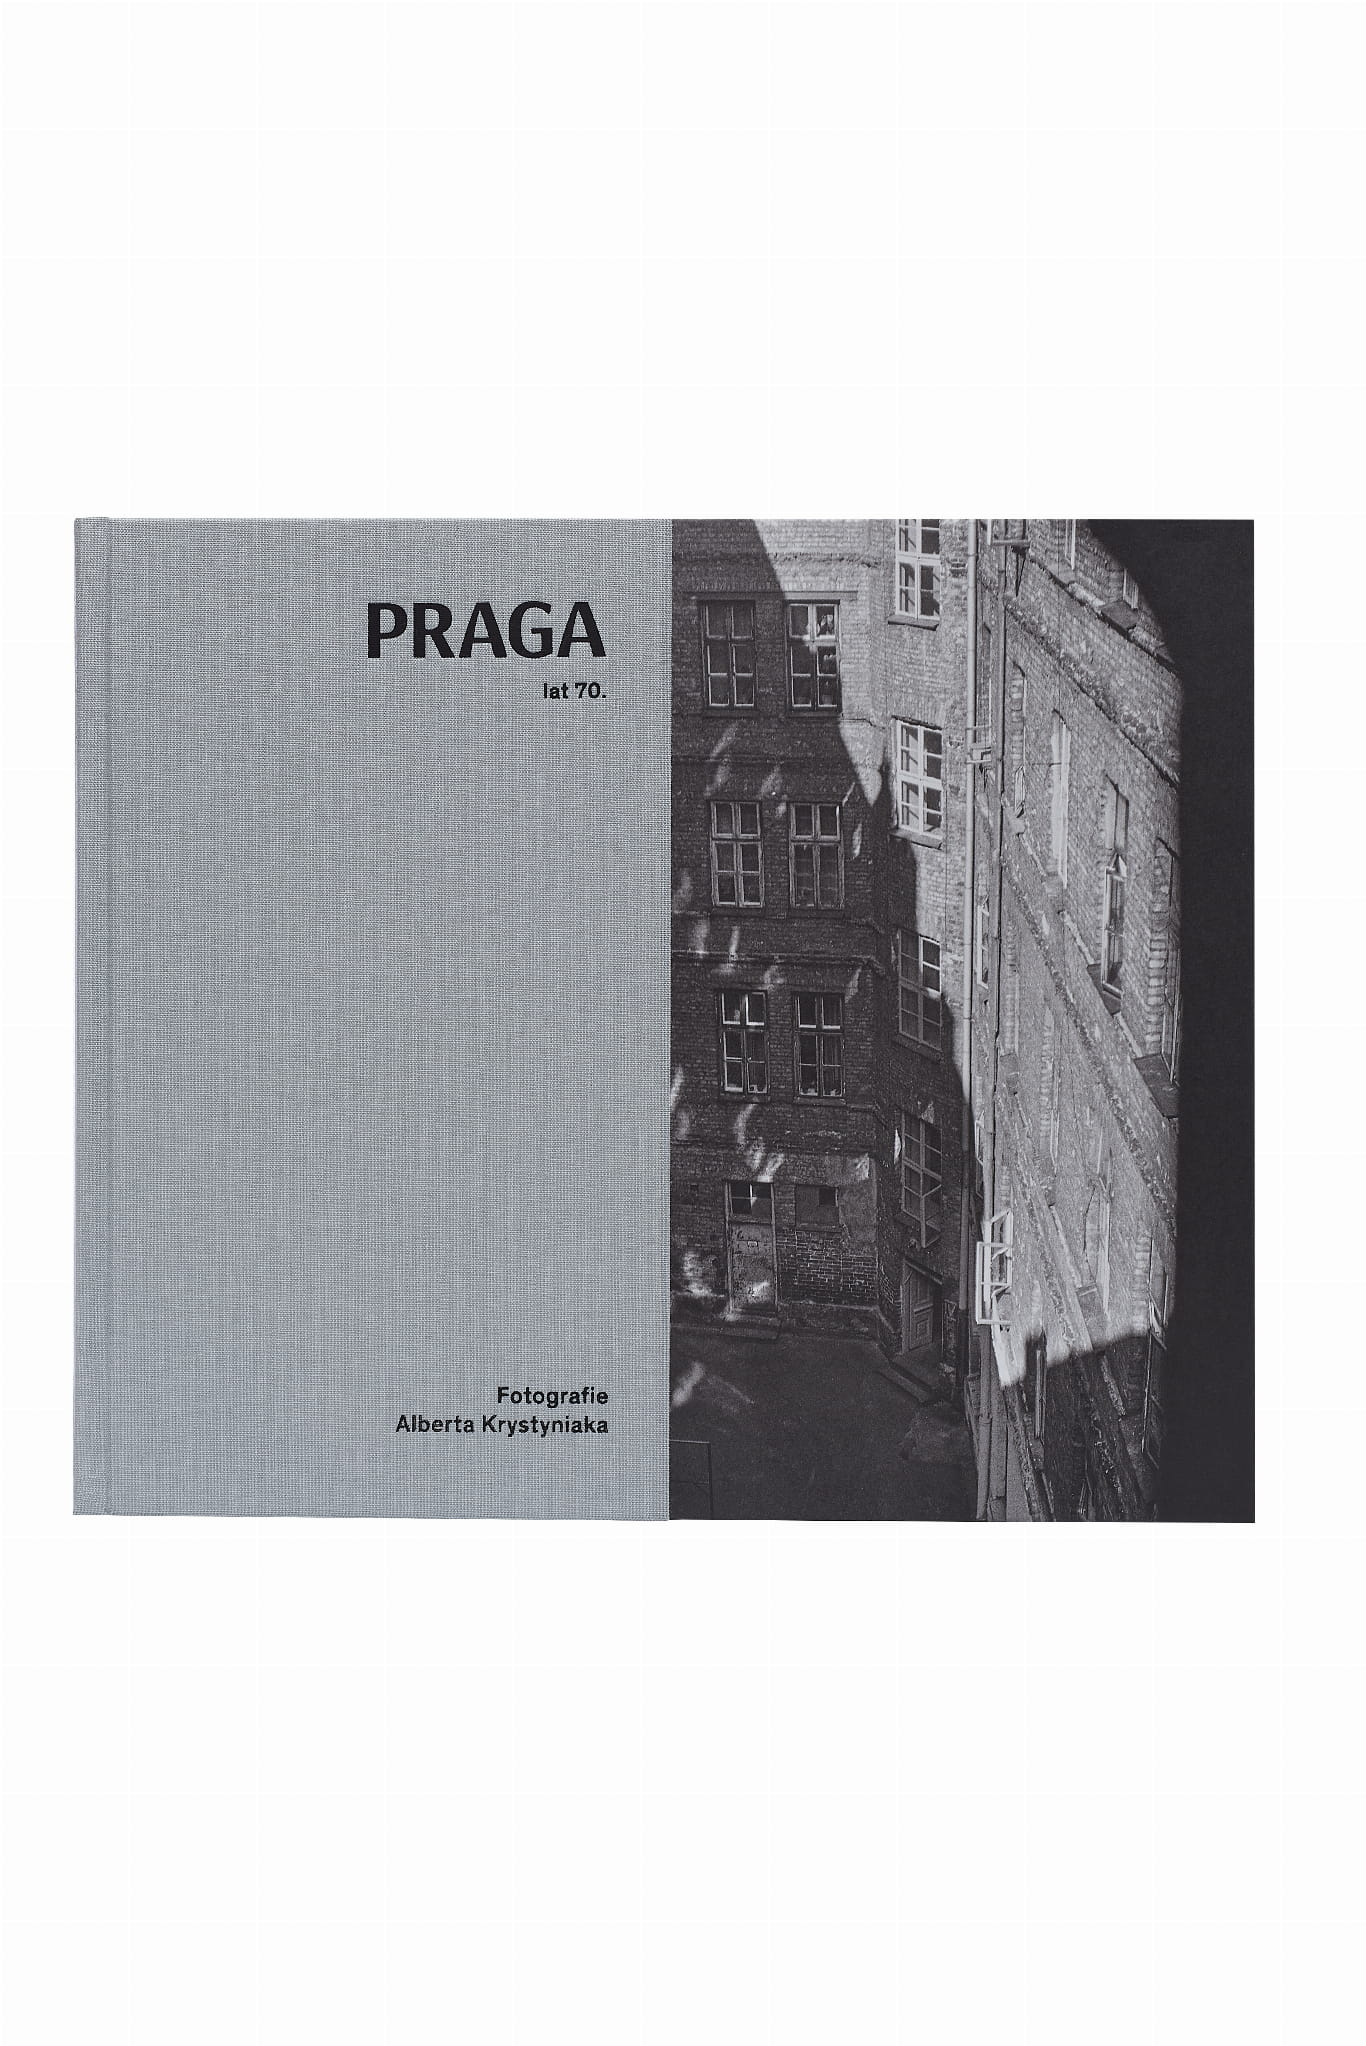 Praga lat 70. Fotografie Alberta Krystyniaka (red. A.Wrońska)